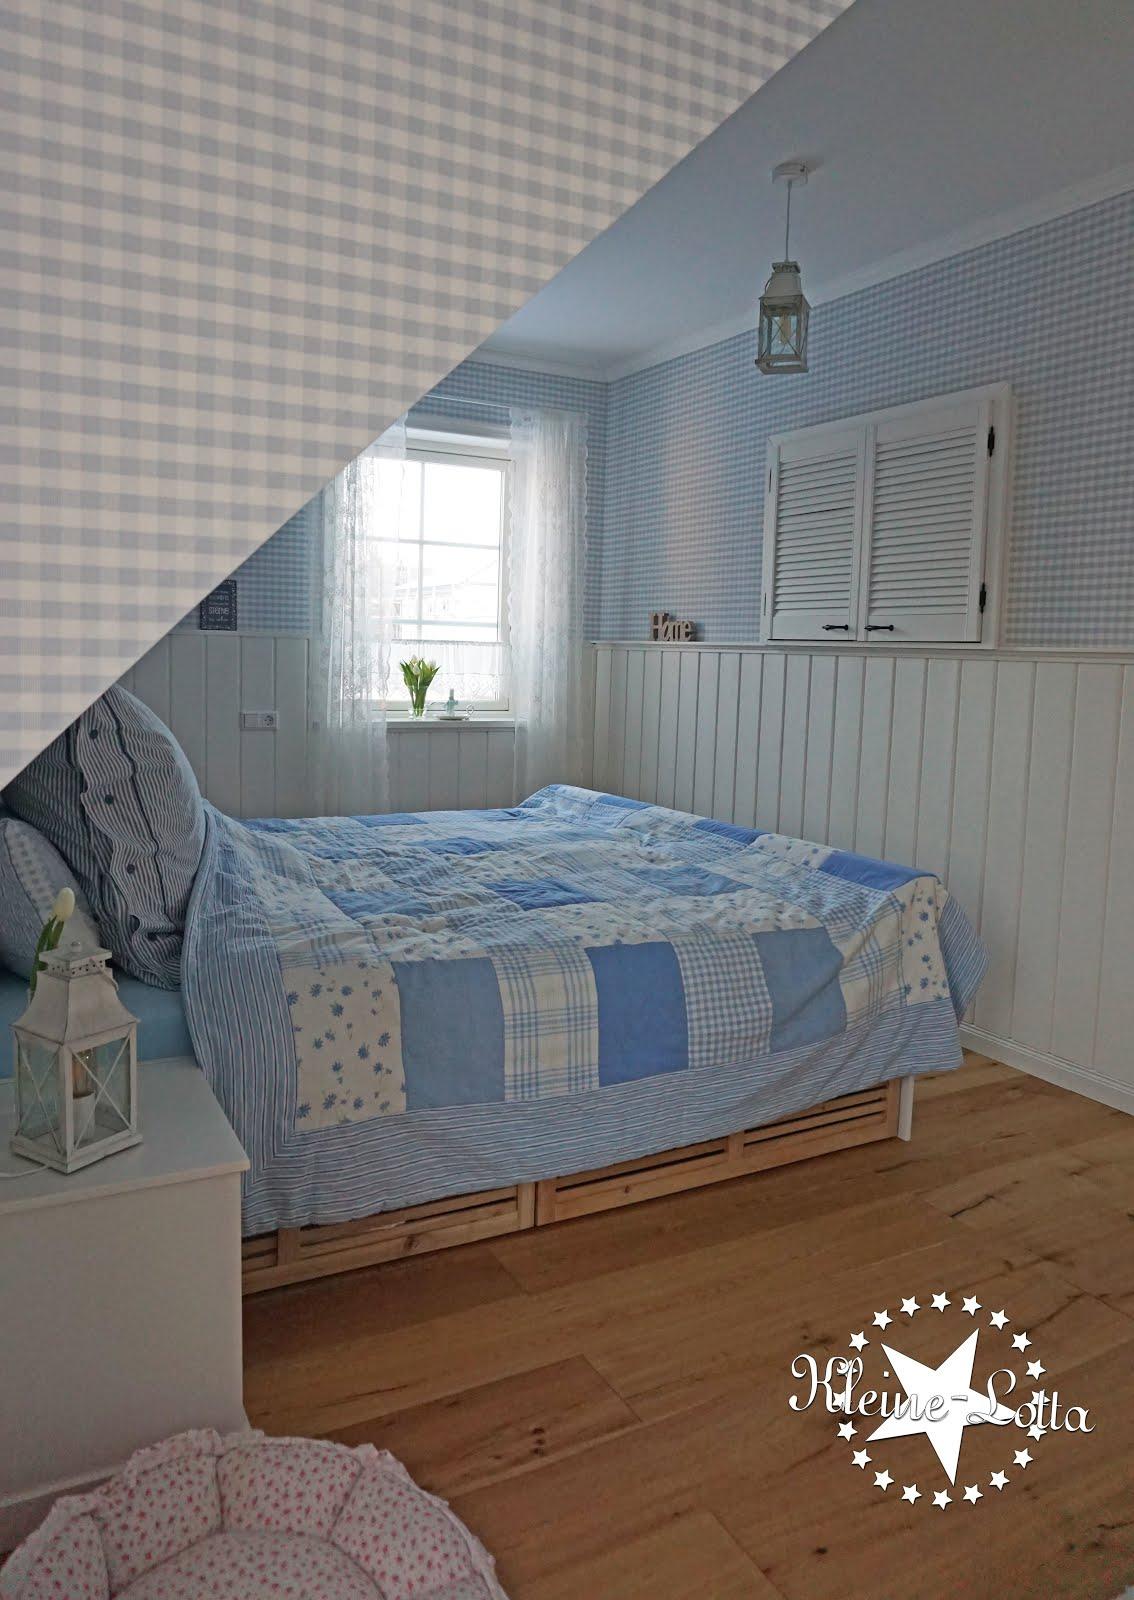 kleine lotta unser schwedenhaus januar 2017. Black Bedroom Furniture Sets. Home Design Ideas